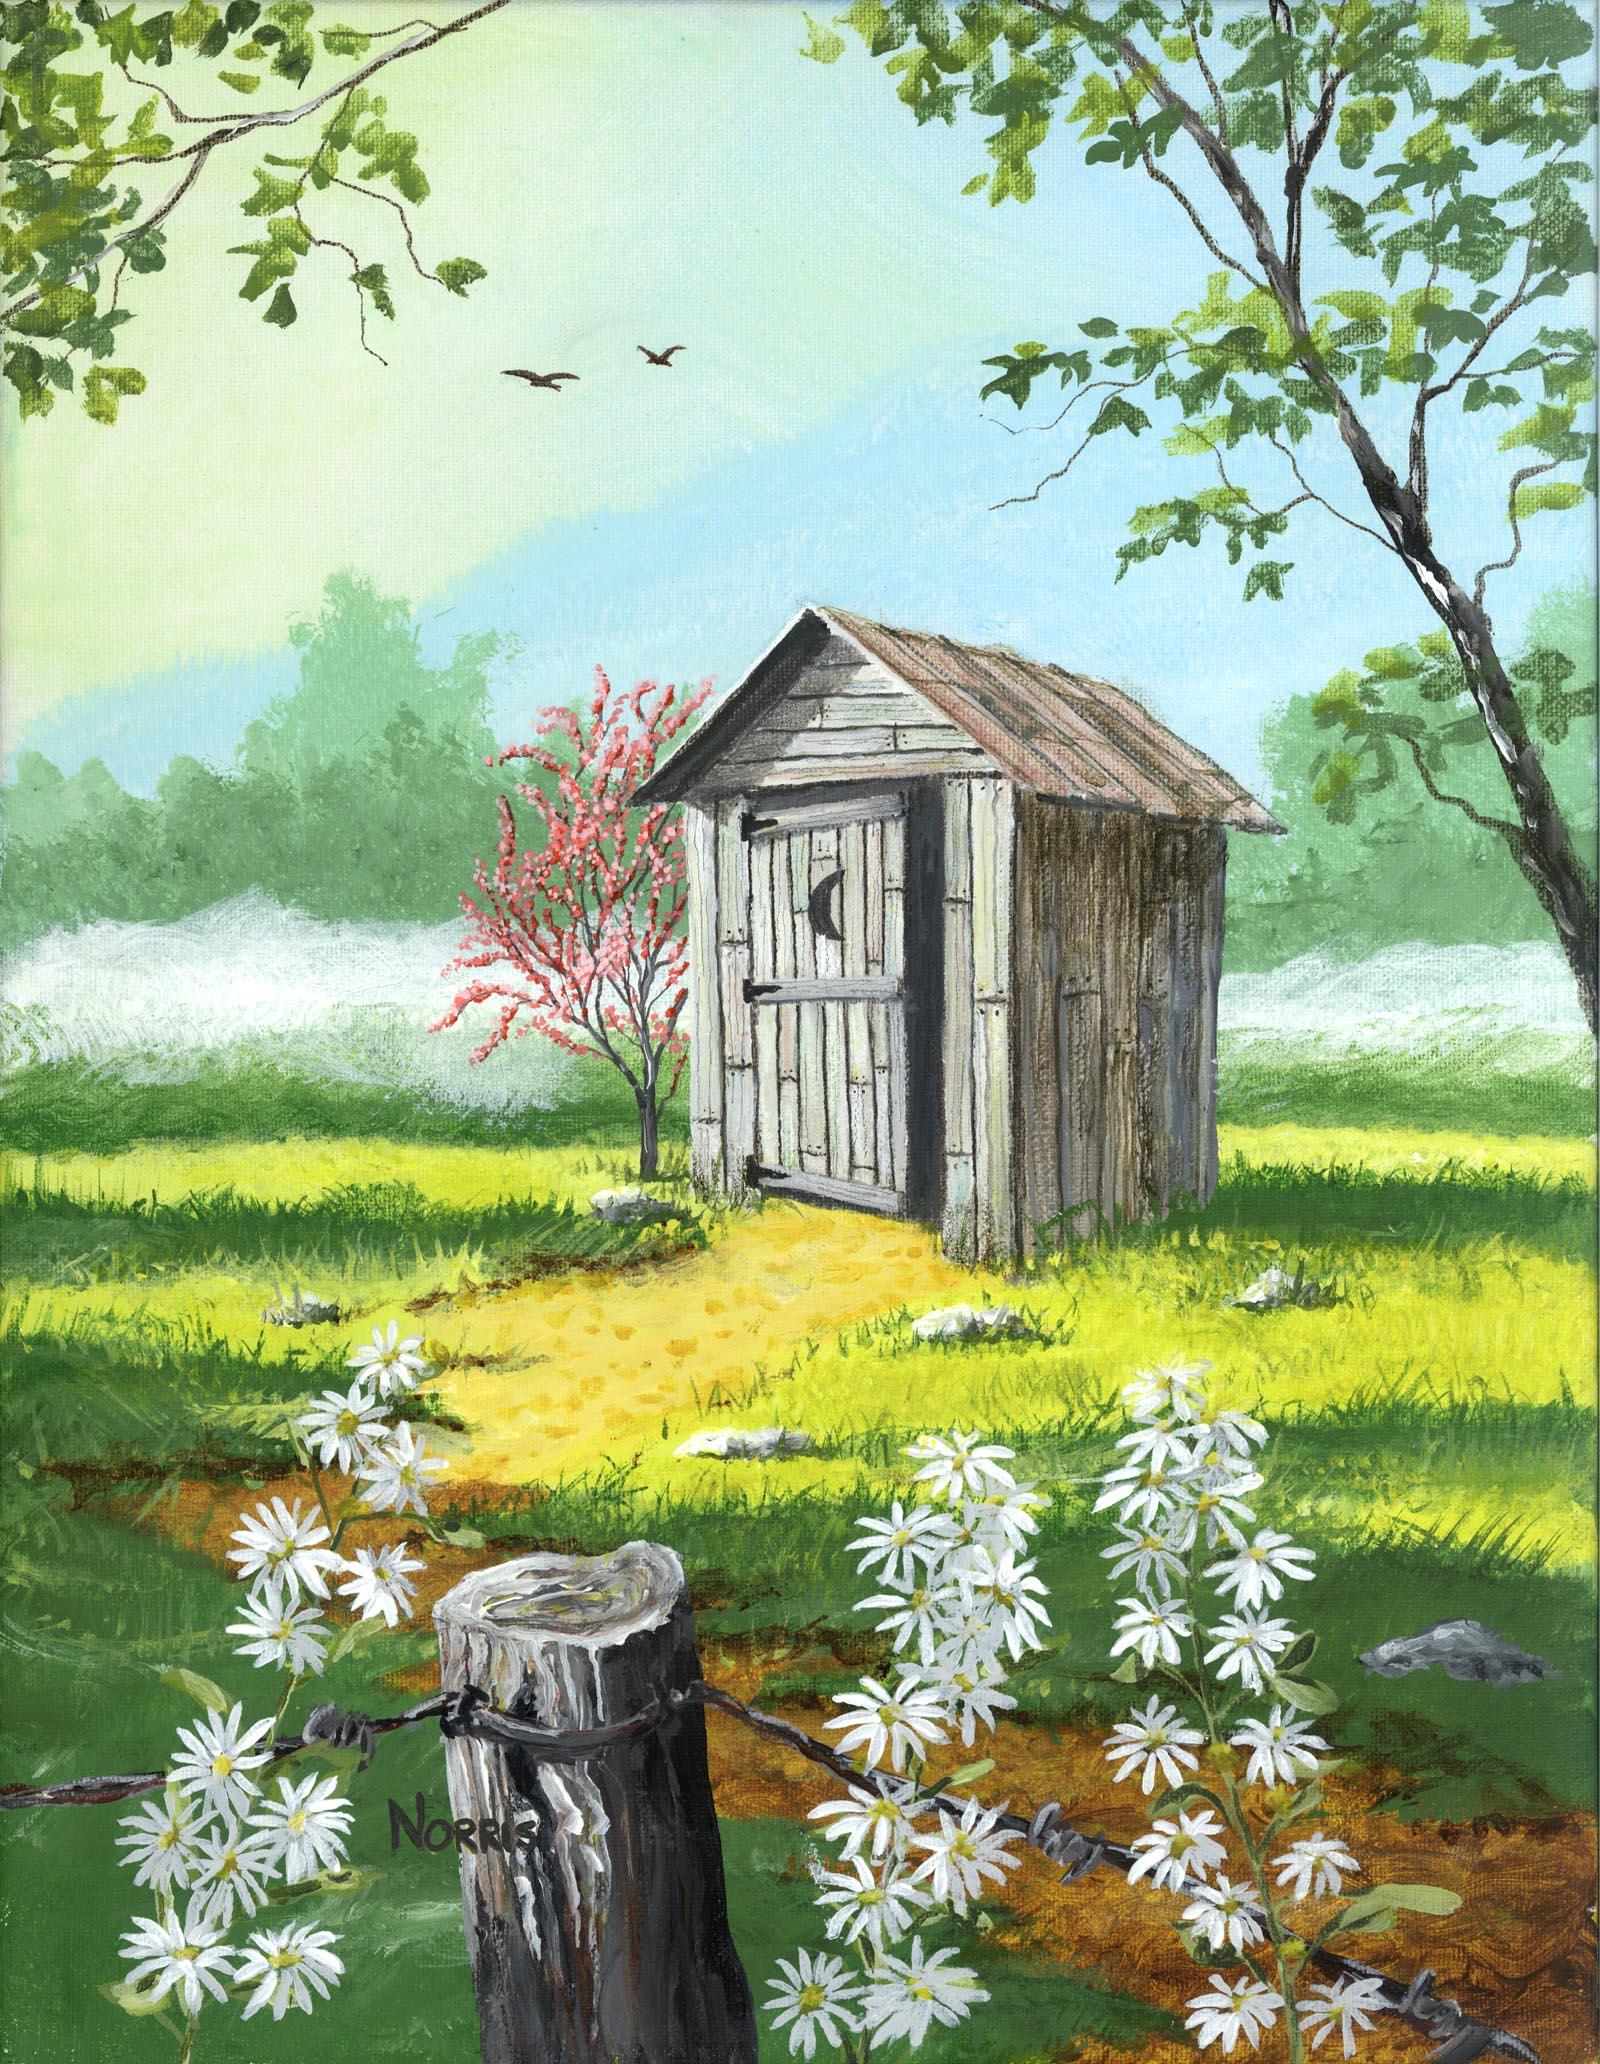 Outhouse #1